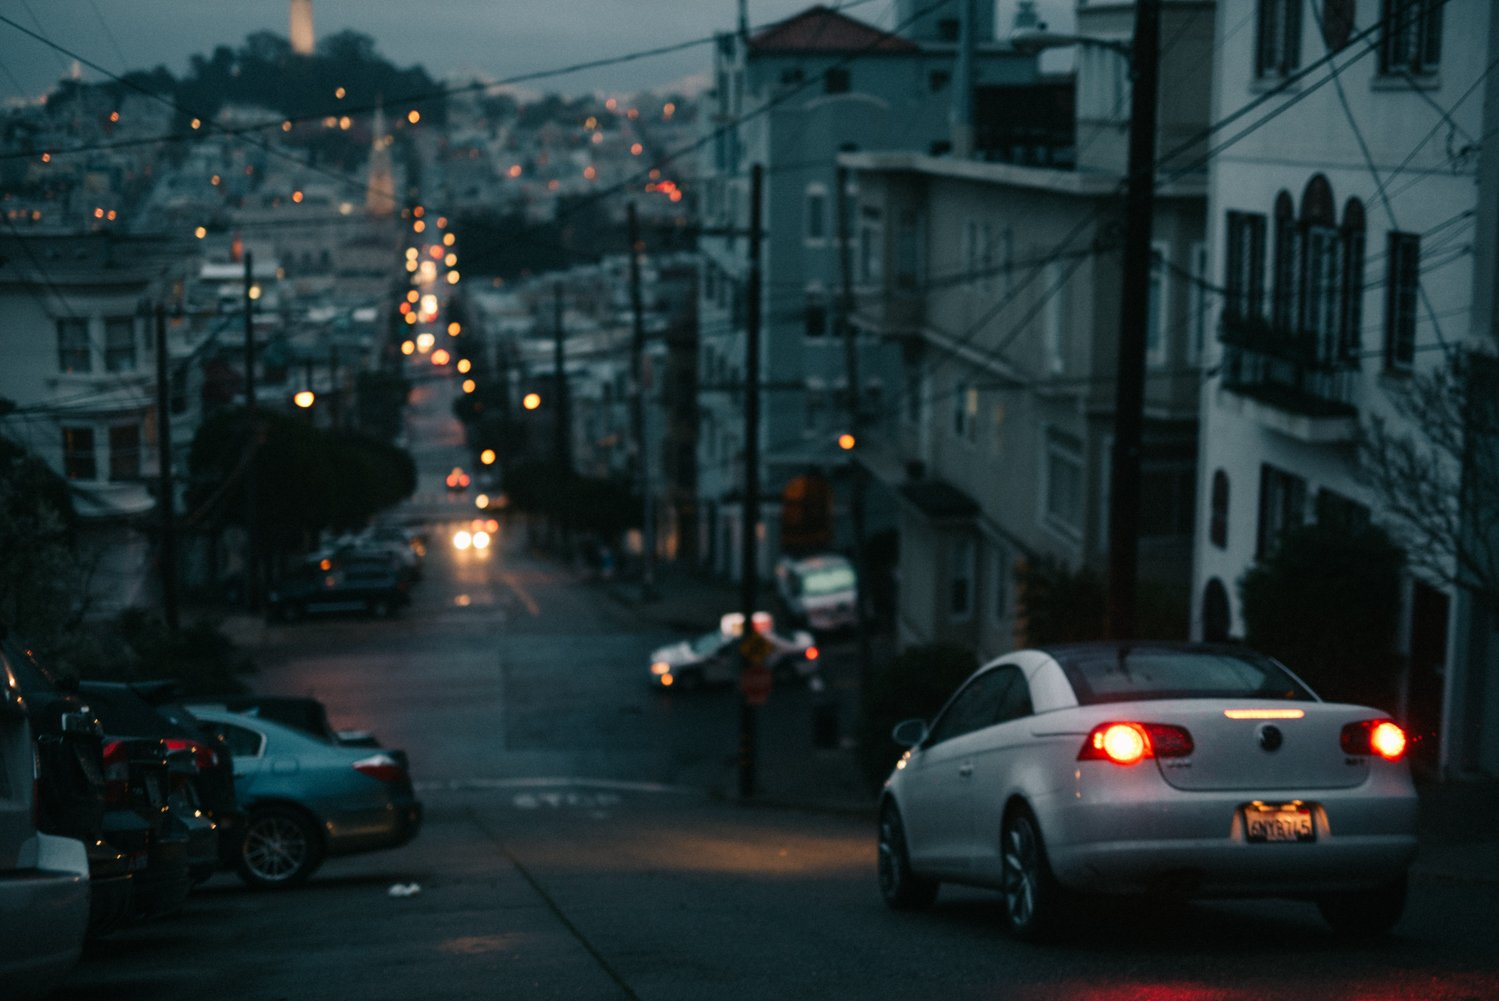 USA ROADTRIP TRAVEL PHOTOGRAPHY-182